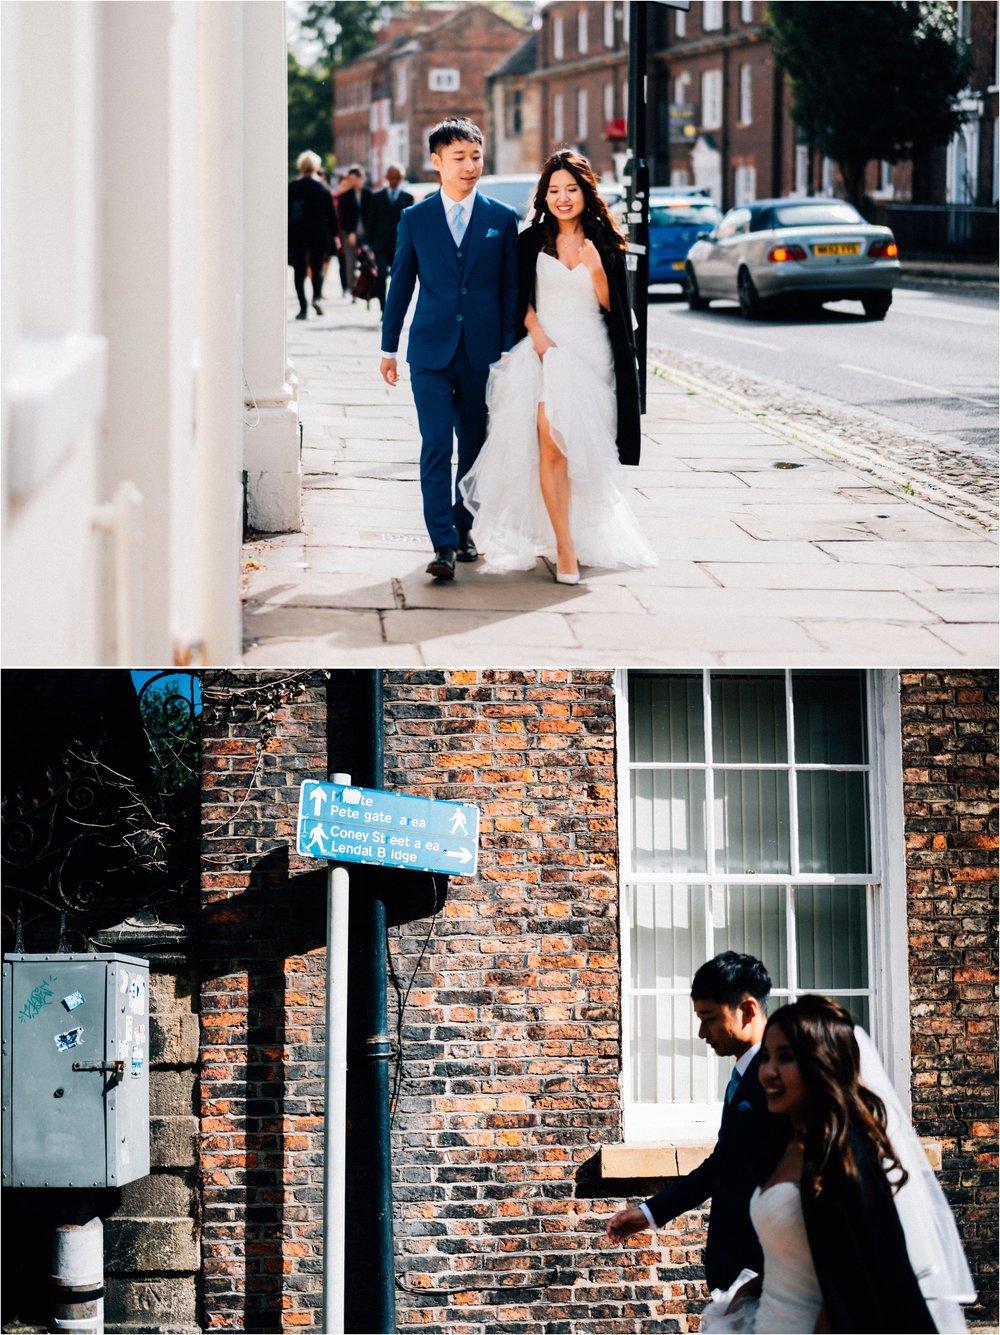 York city elopement wedding photographer_0154.jpg